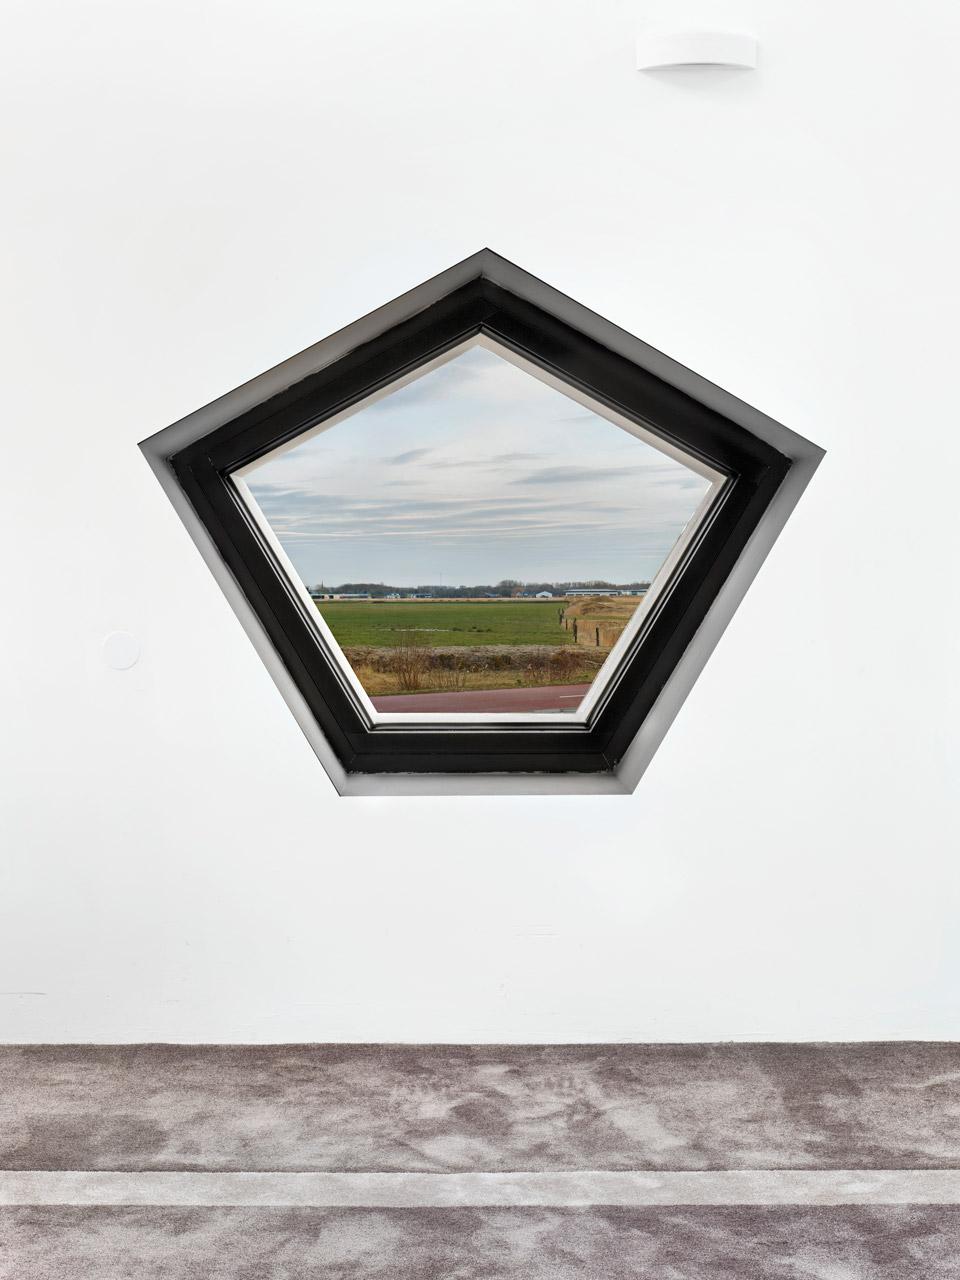 New Dutch Views #2 The Netherlands, 2018